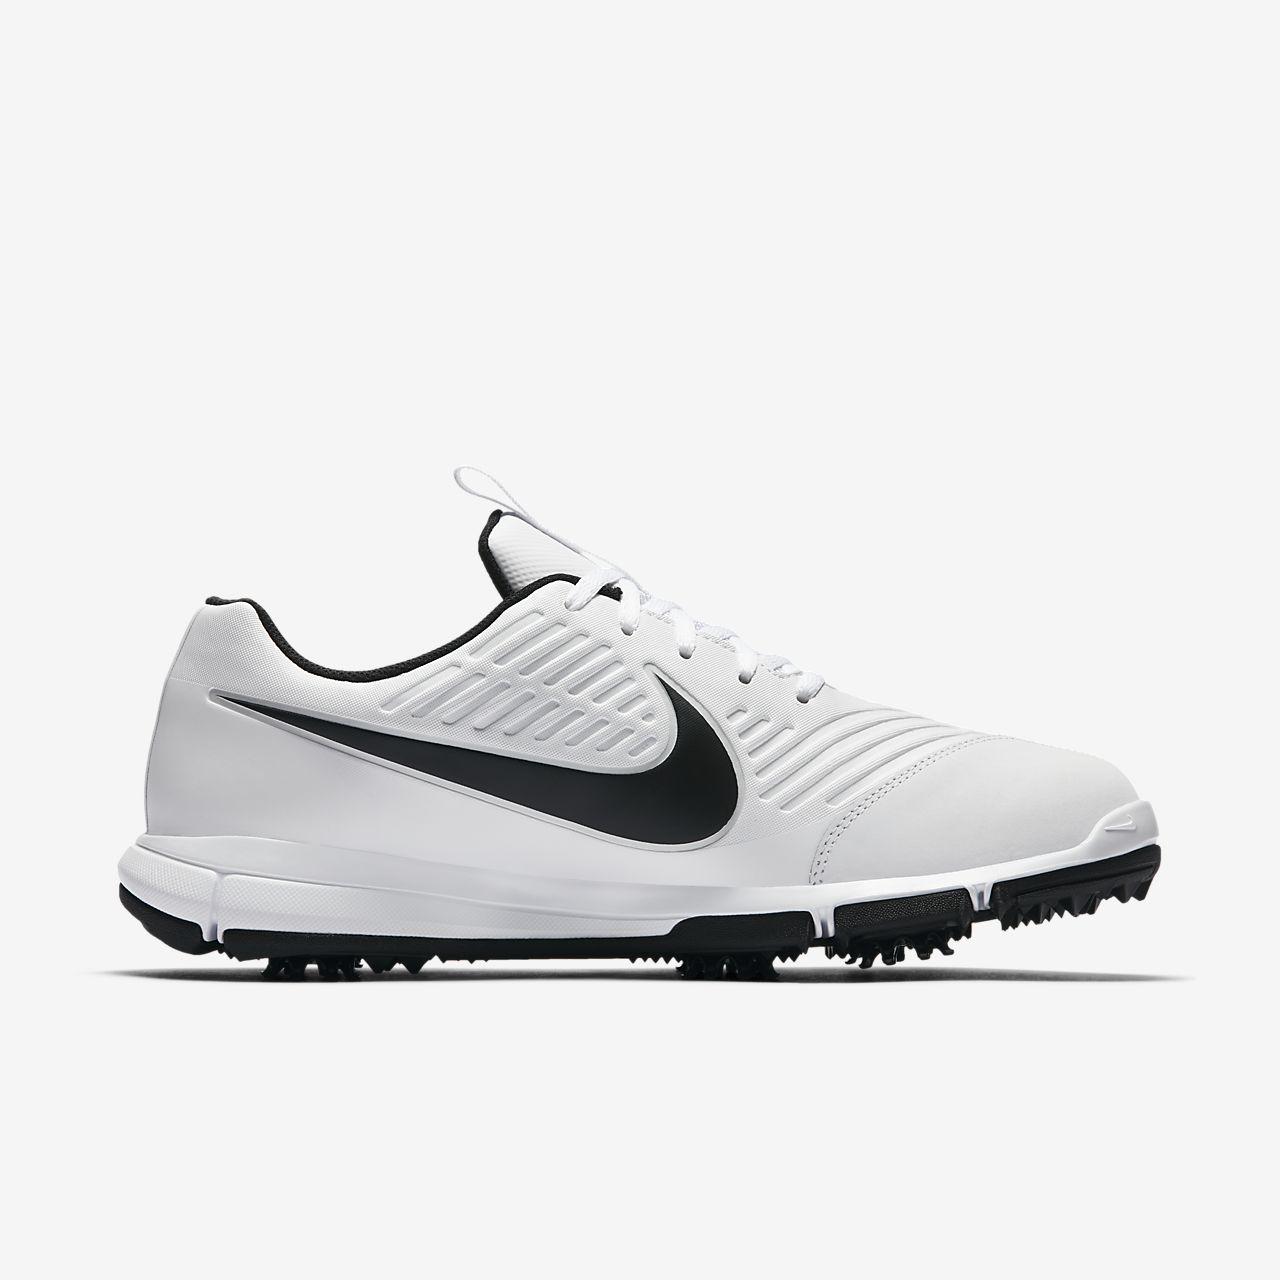 ... Nike Explorer 2 S Men's Golf Shoe